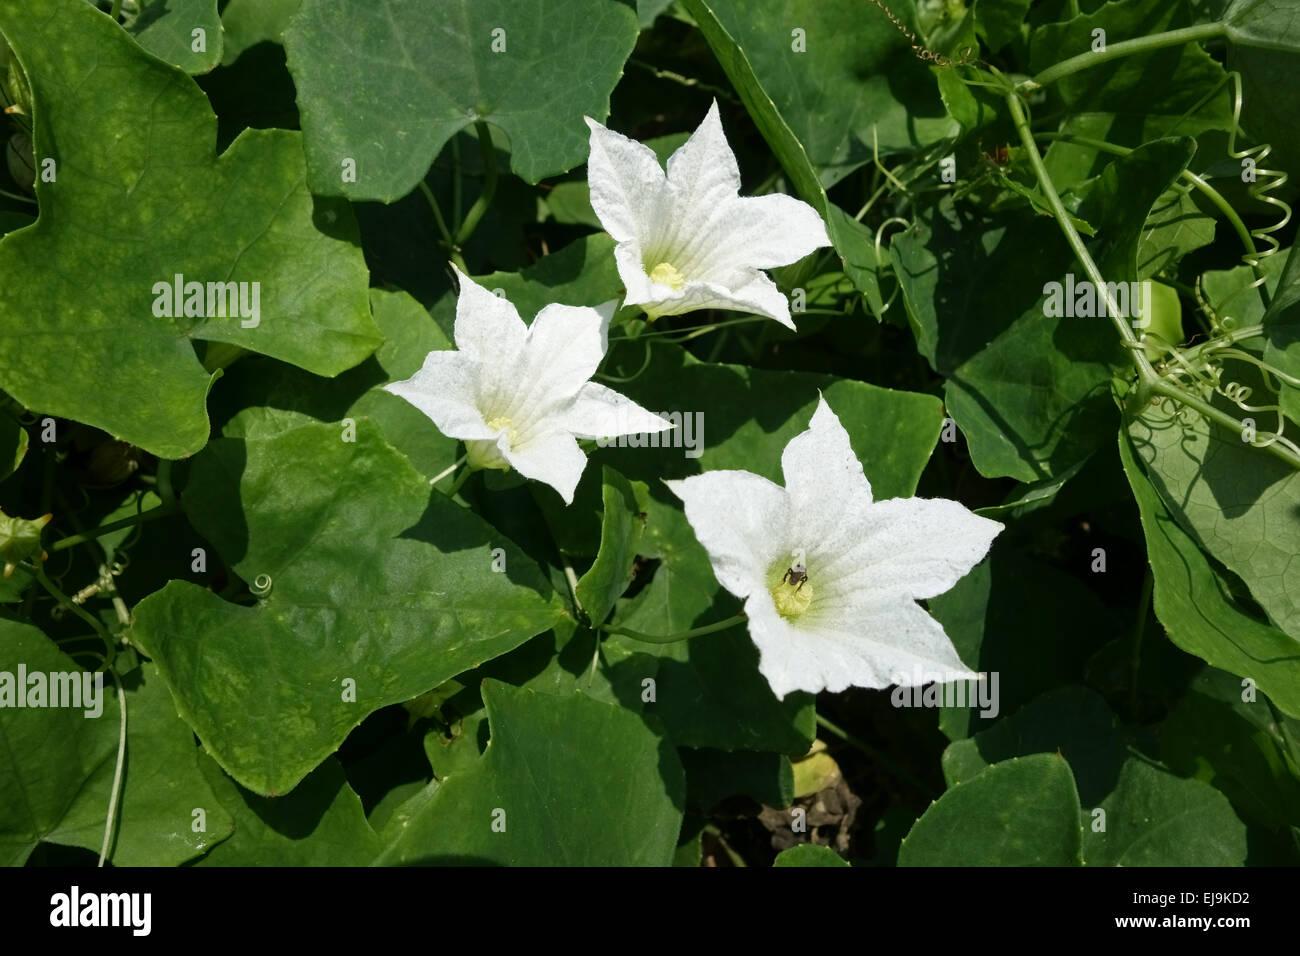 Ivy Gourd Coccinia Grandis White Flowers On Curcurbit